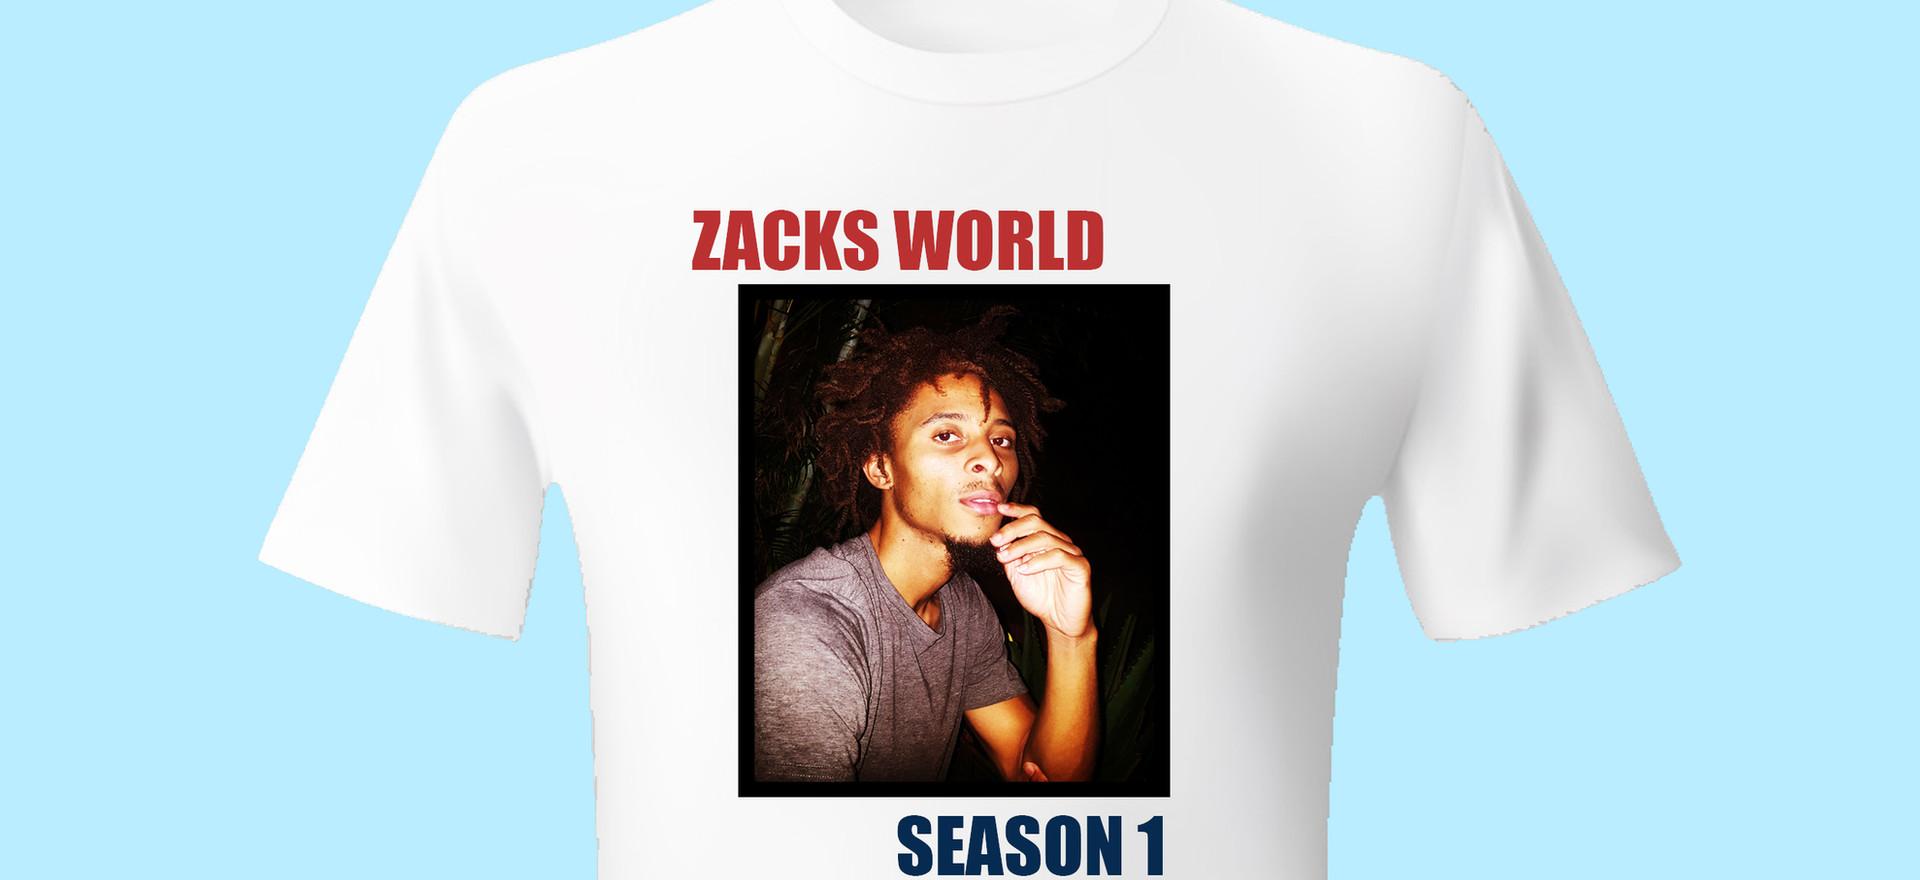 Zacks World Season 1 Tshirt1.jpg